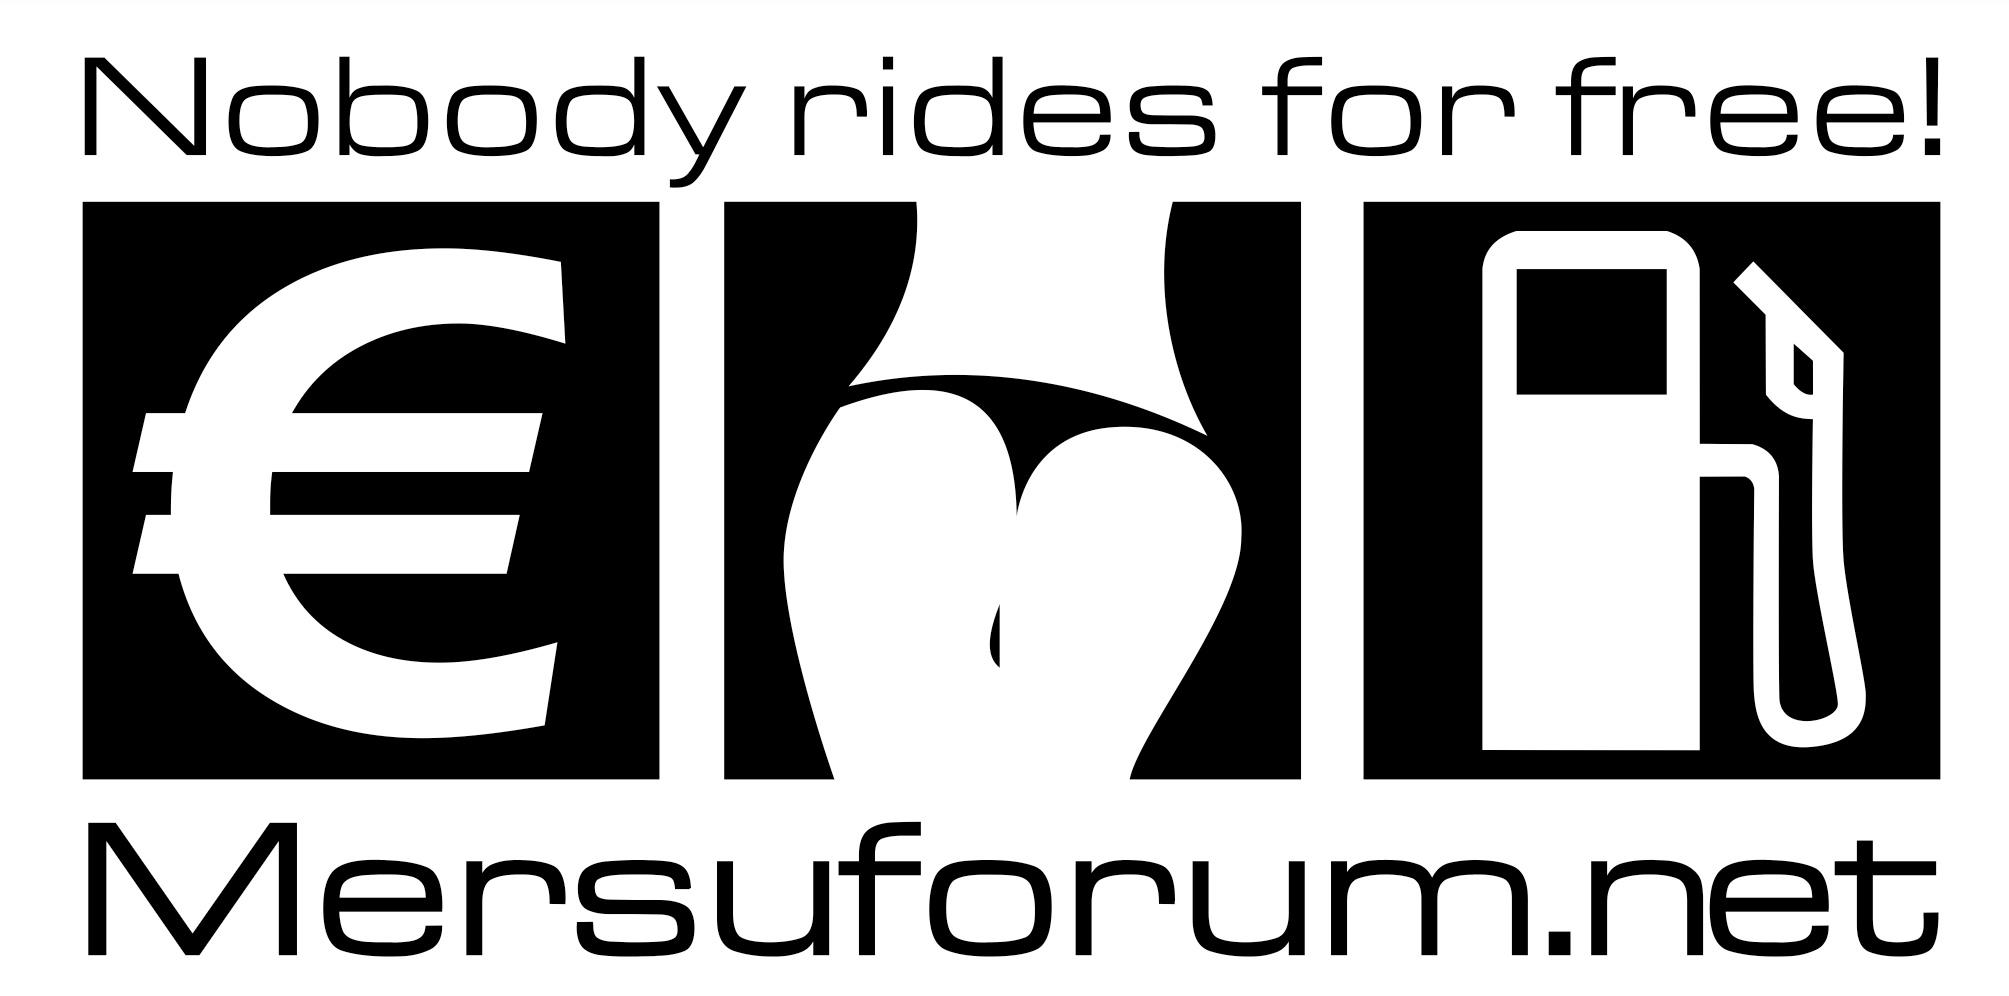 Nobody rides for free! -tarra